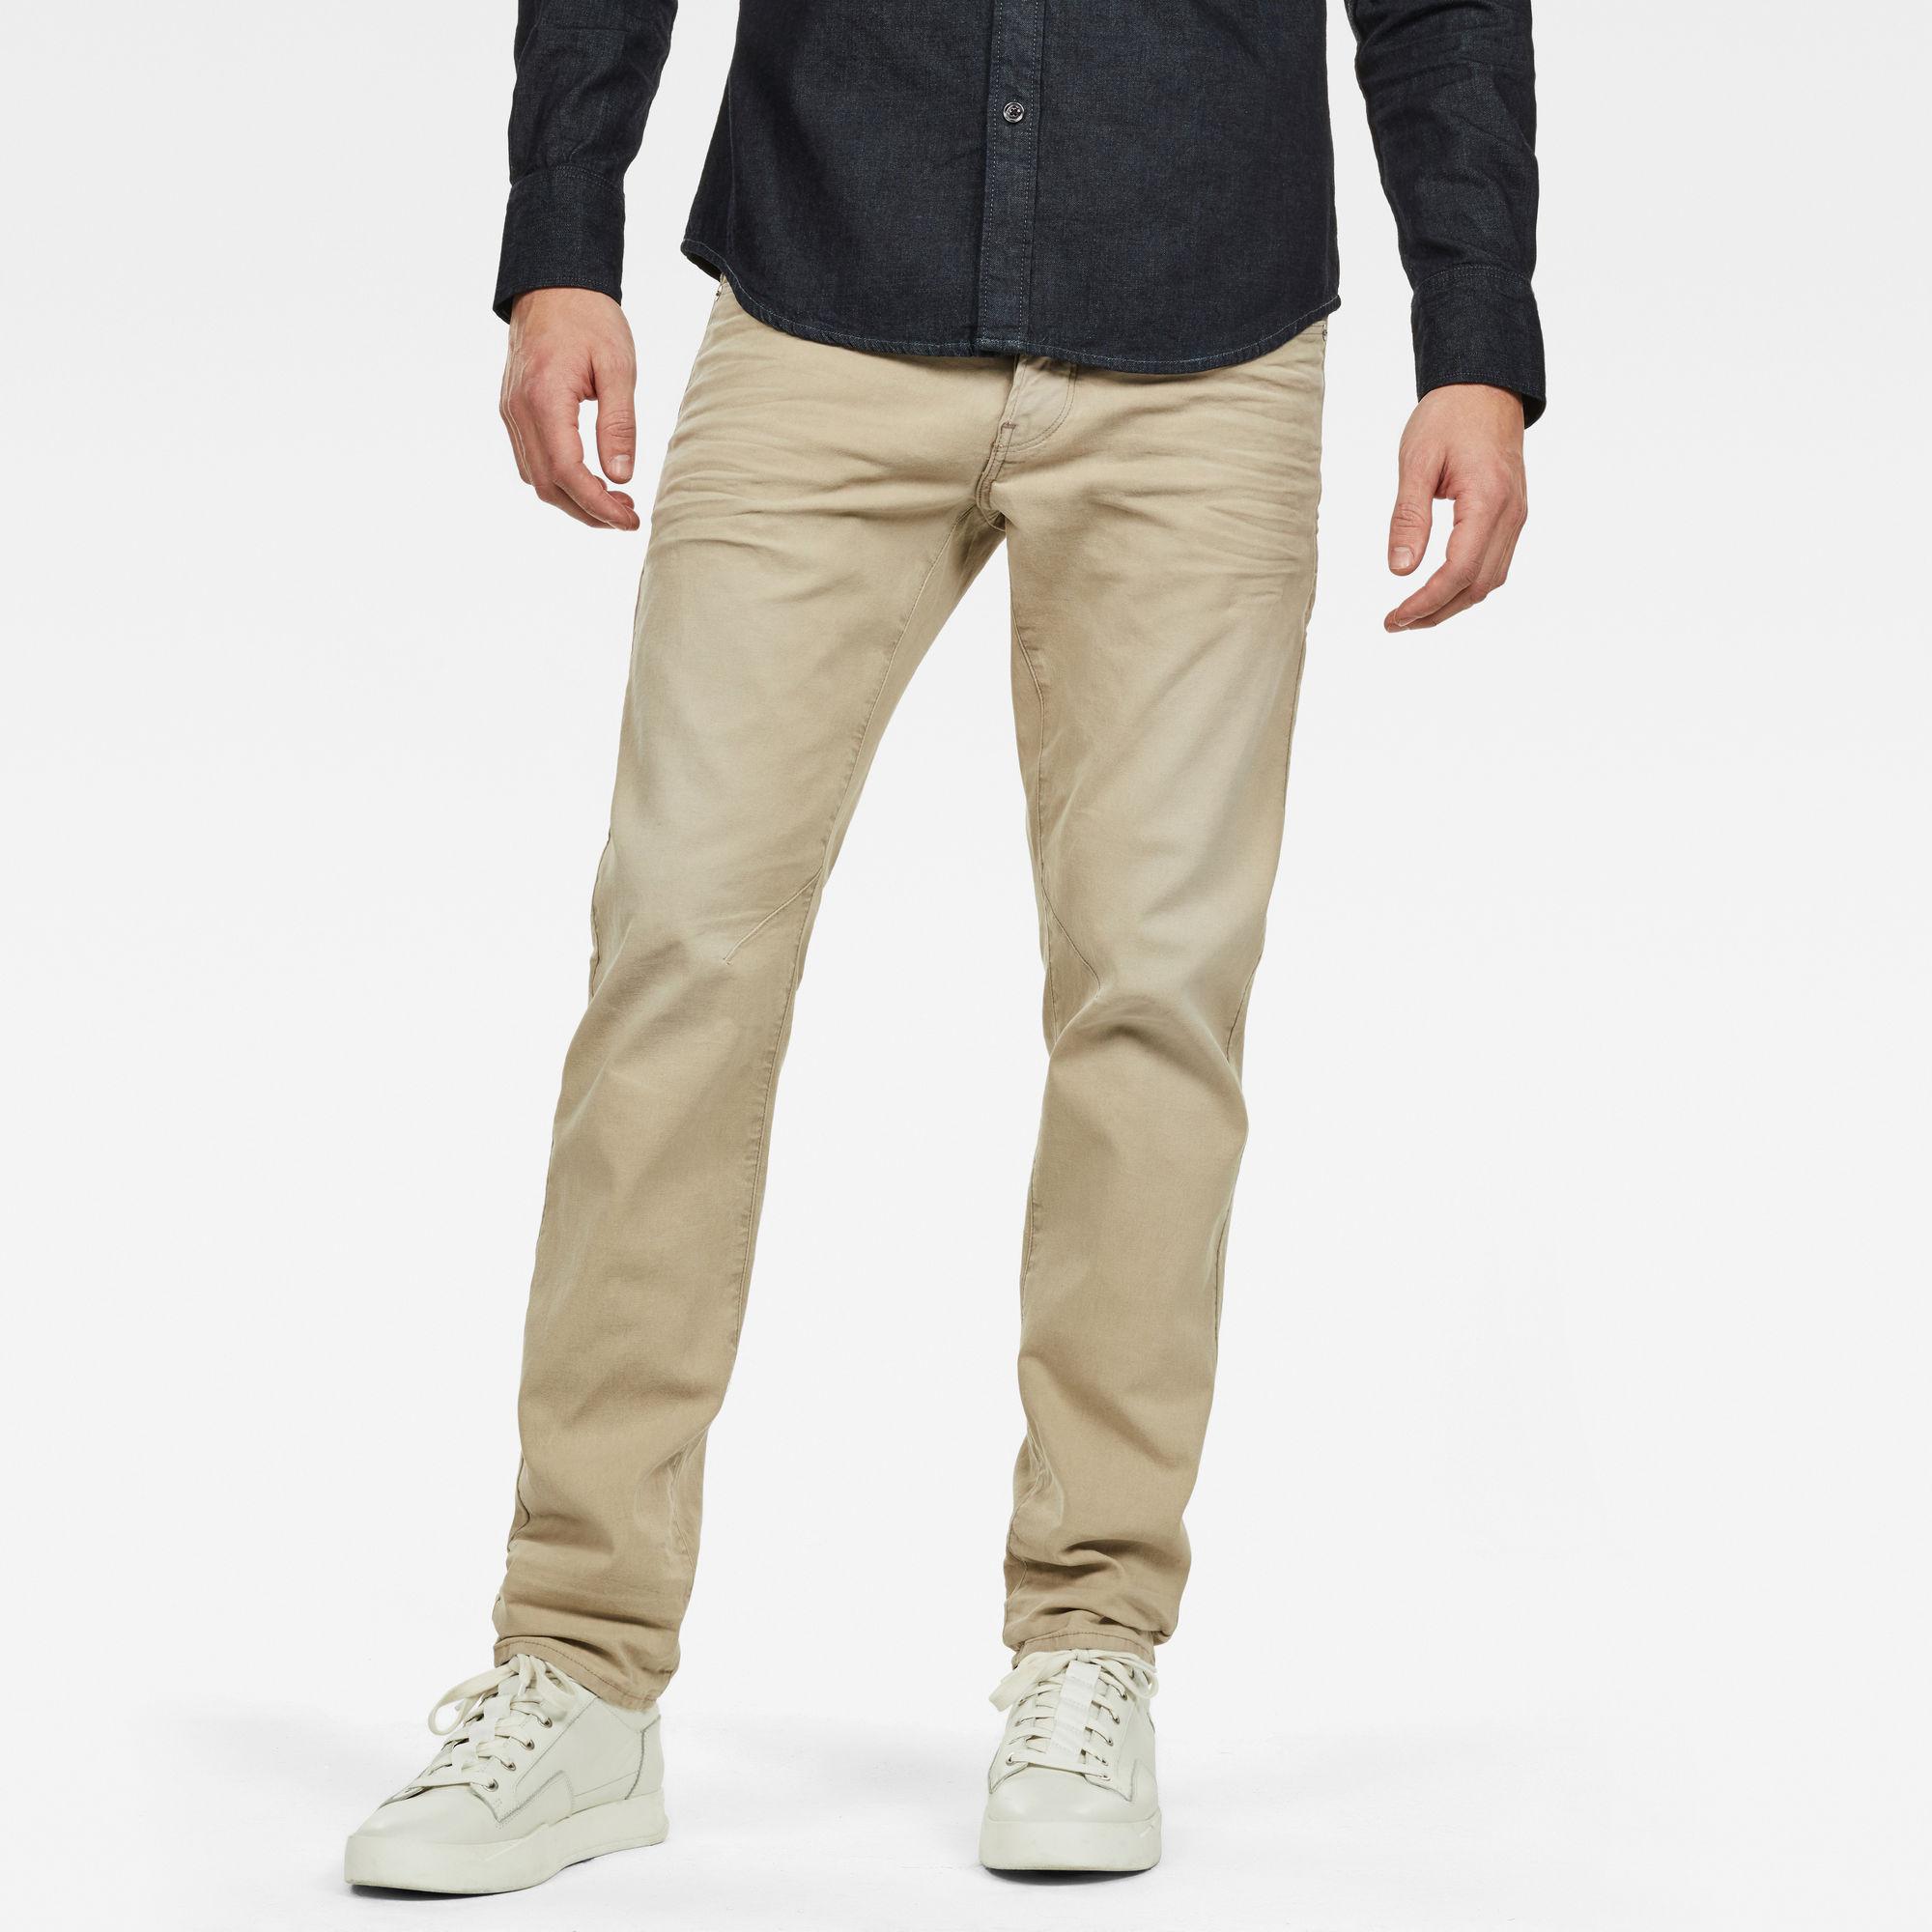 Van G Star Raw D-Staq 5-Pocket Straight Colored Jeans Prijsvergelijk nu!